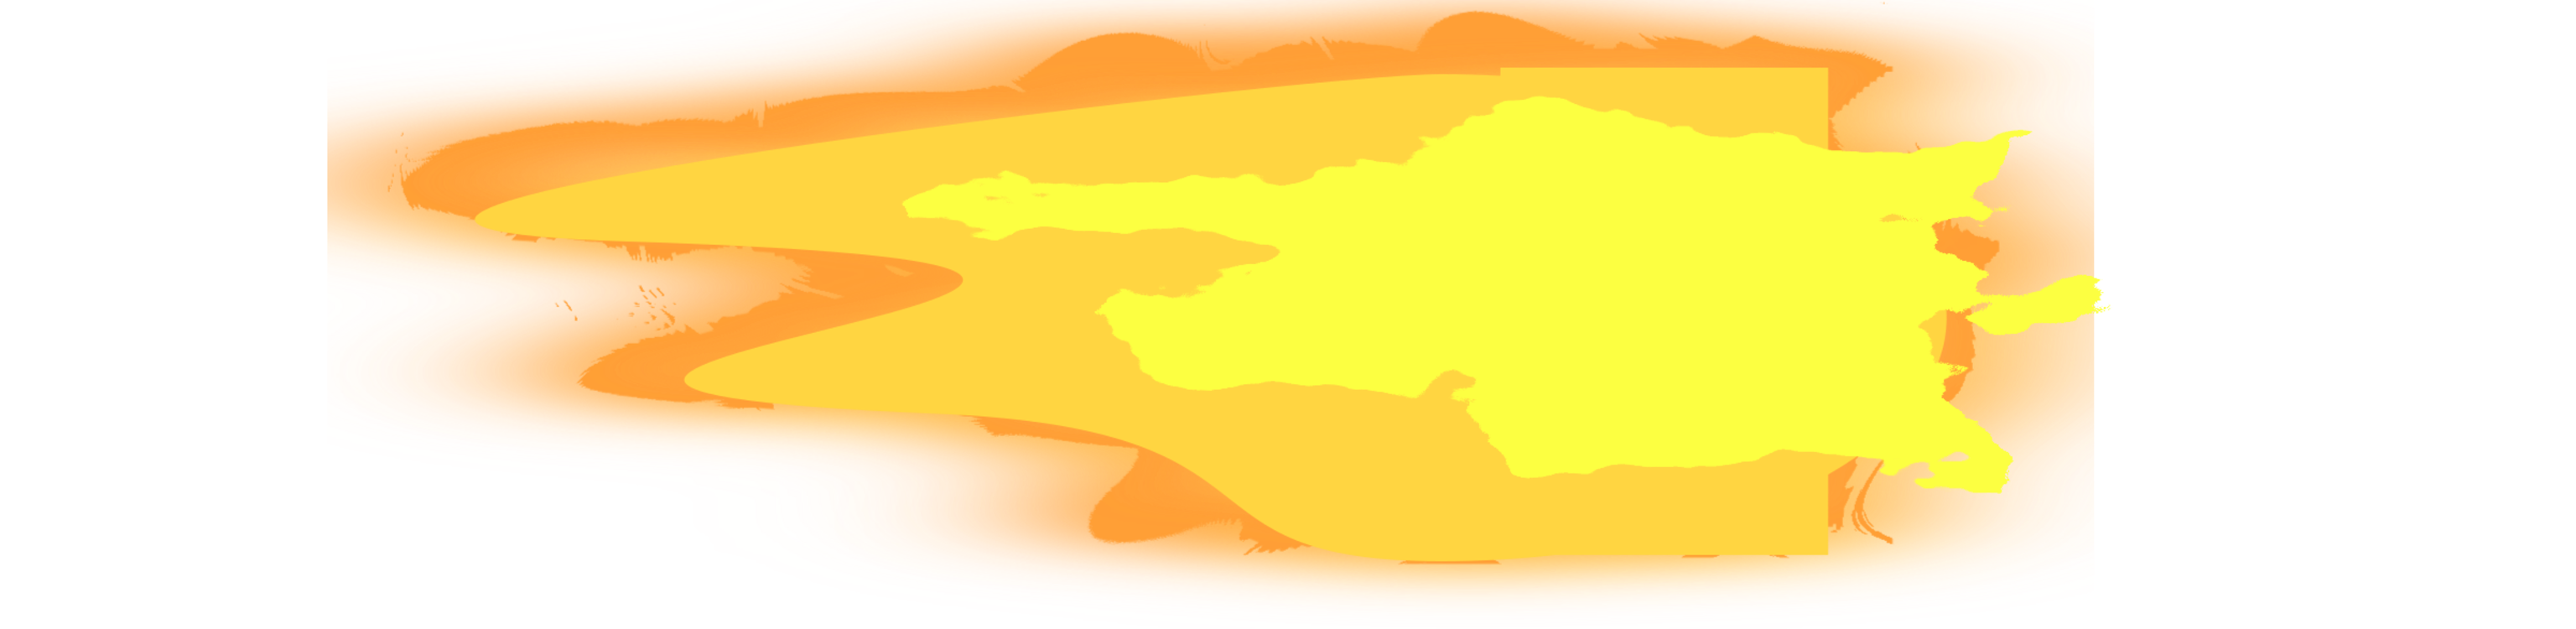 Orange,Computer Wallpaper,Yellow